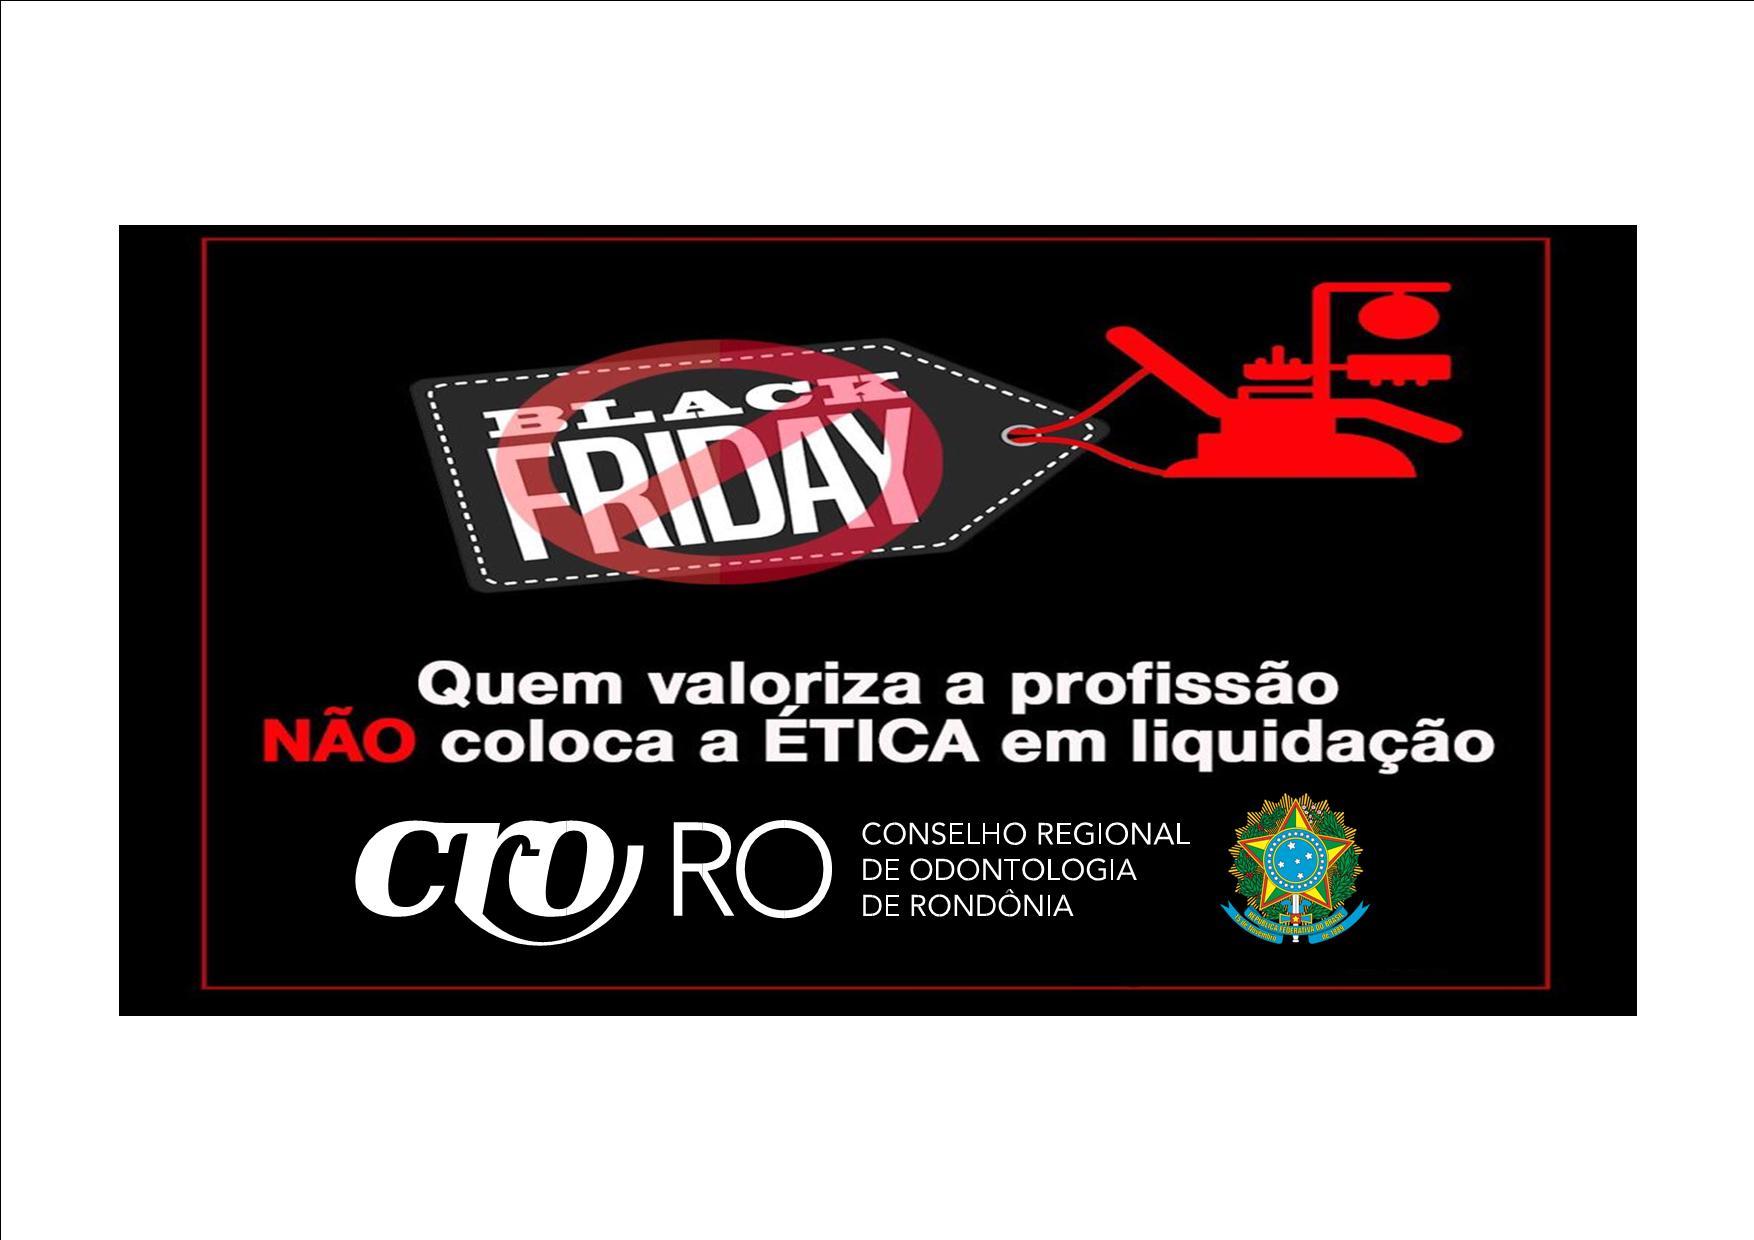 CRO-RO ALERTA: BLACK FRIDAY